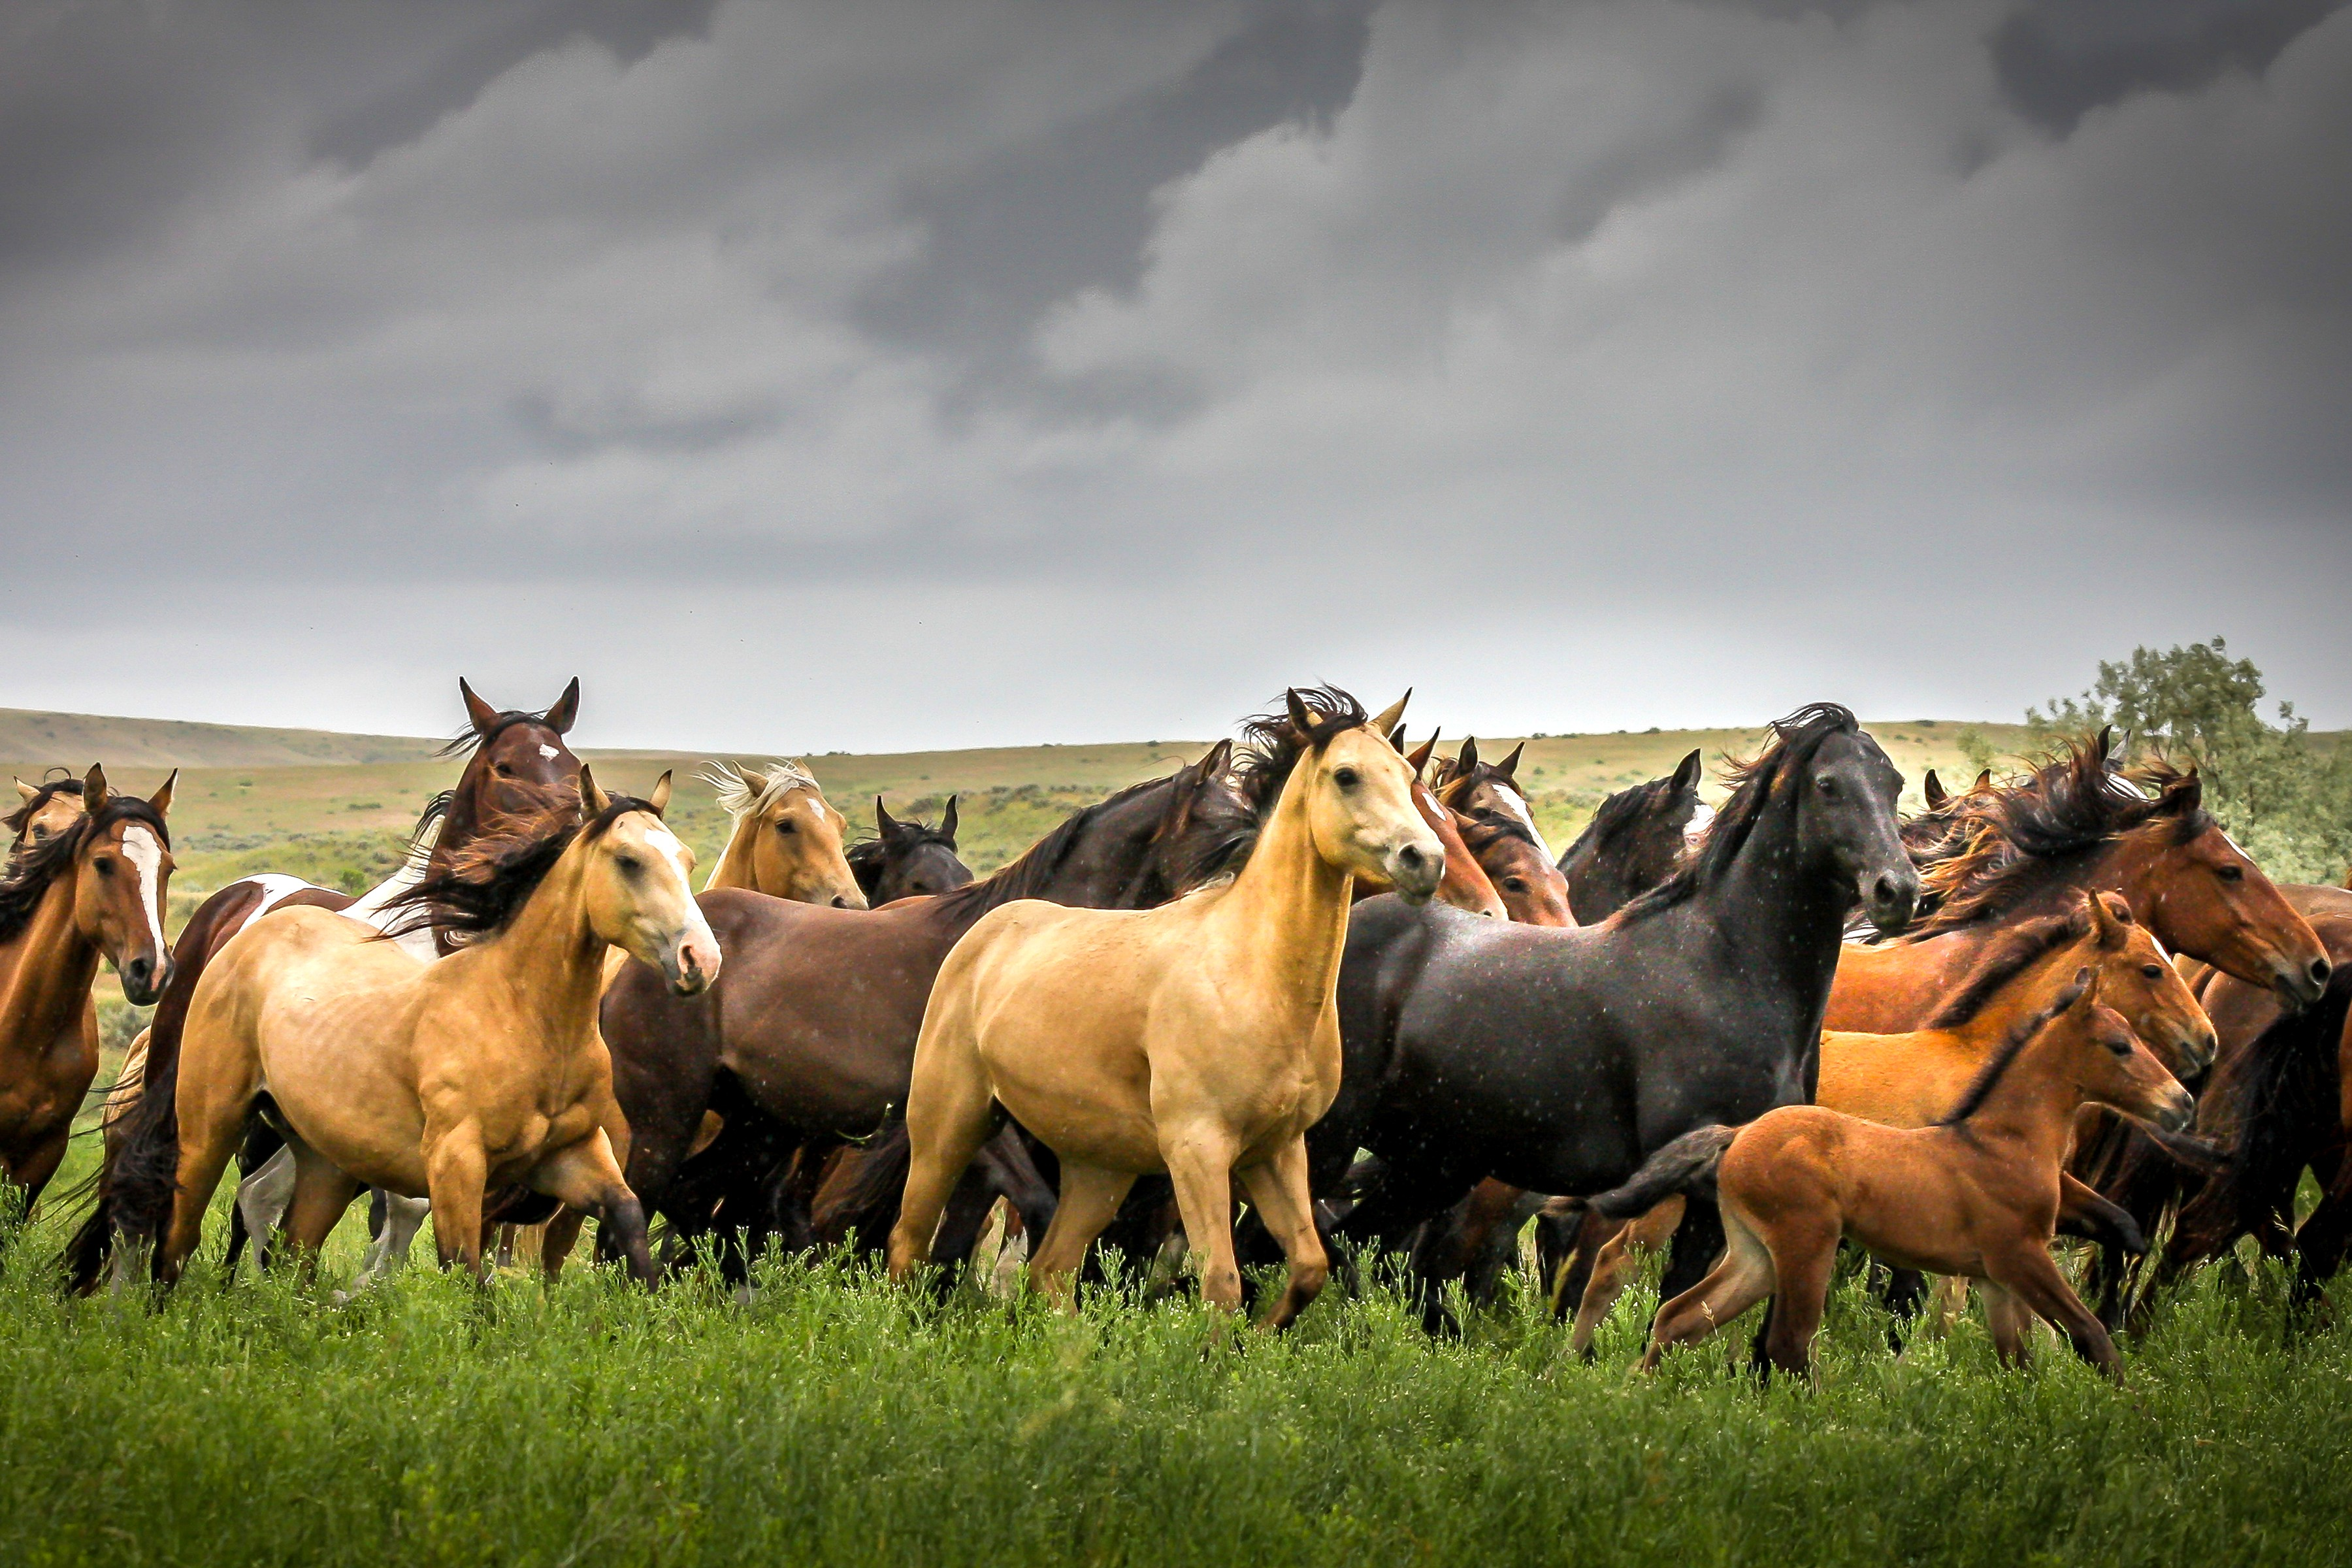 Montana Wild Horses in Rainstorm